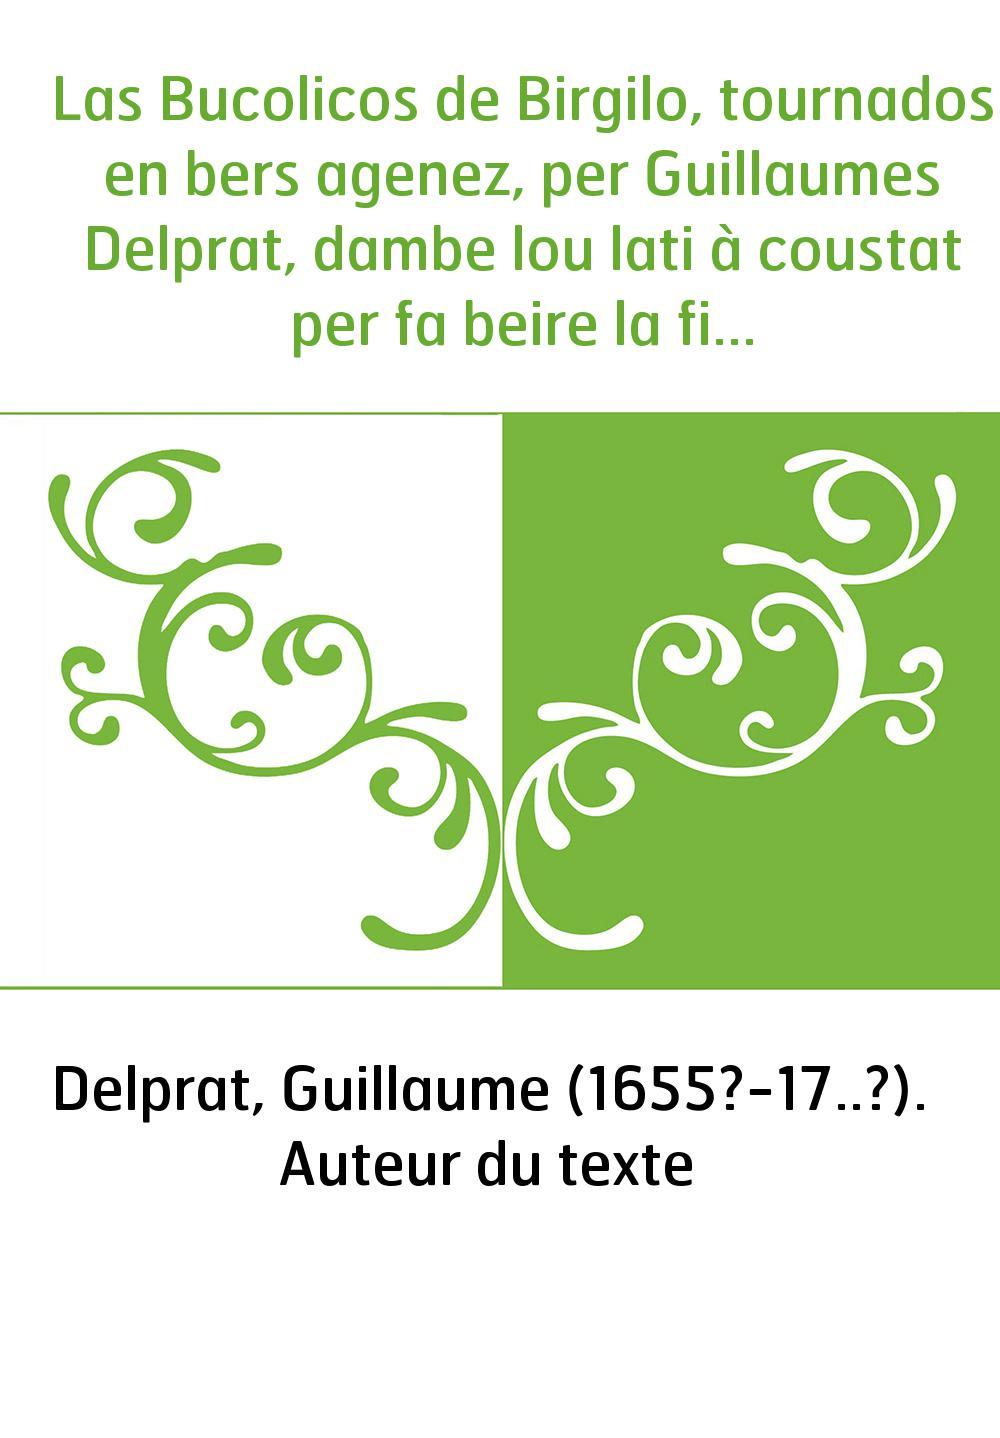 Las Bucolicos de Birgilo, tournados en bers agenez, per Guillaumes Delprat, dambe lou lati à coustat per fa beire la fidelitat d